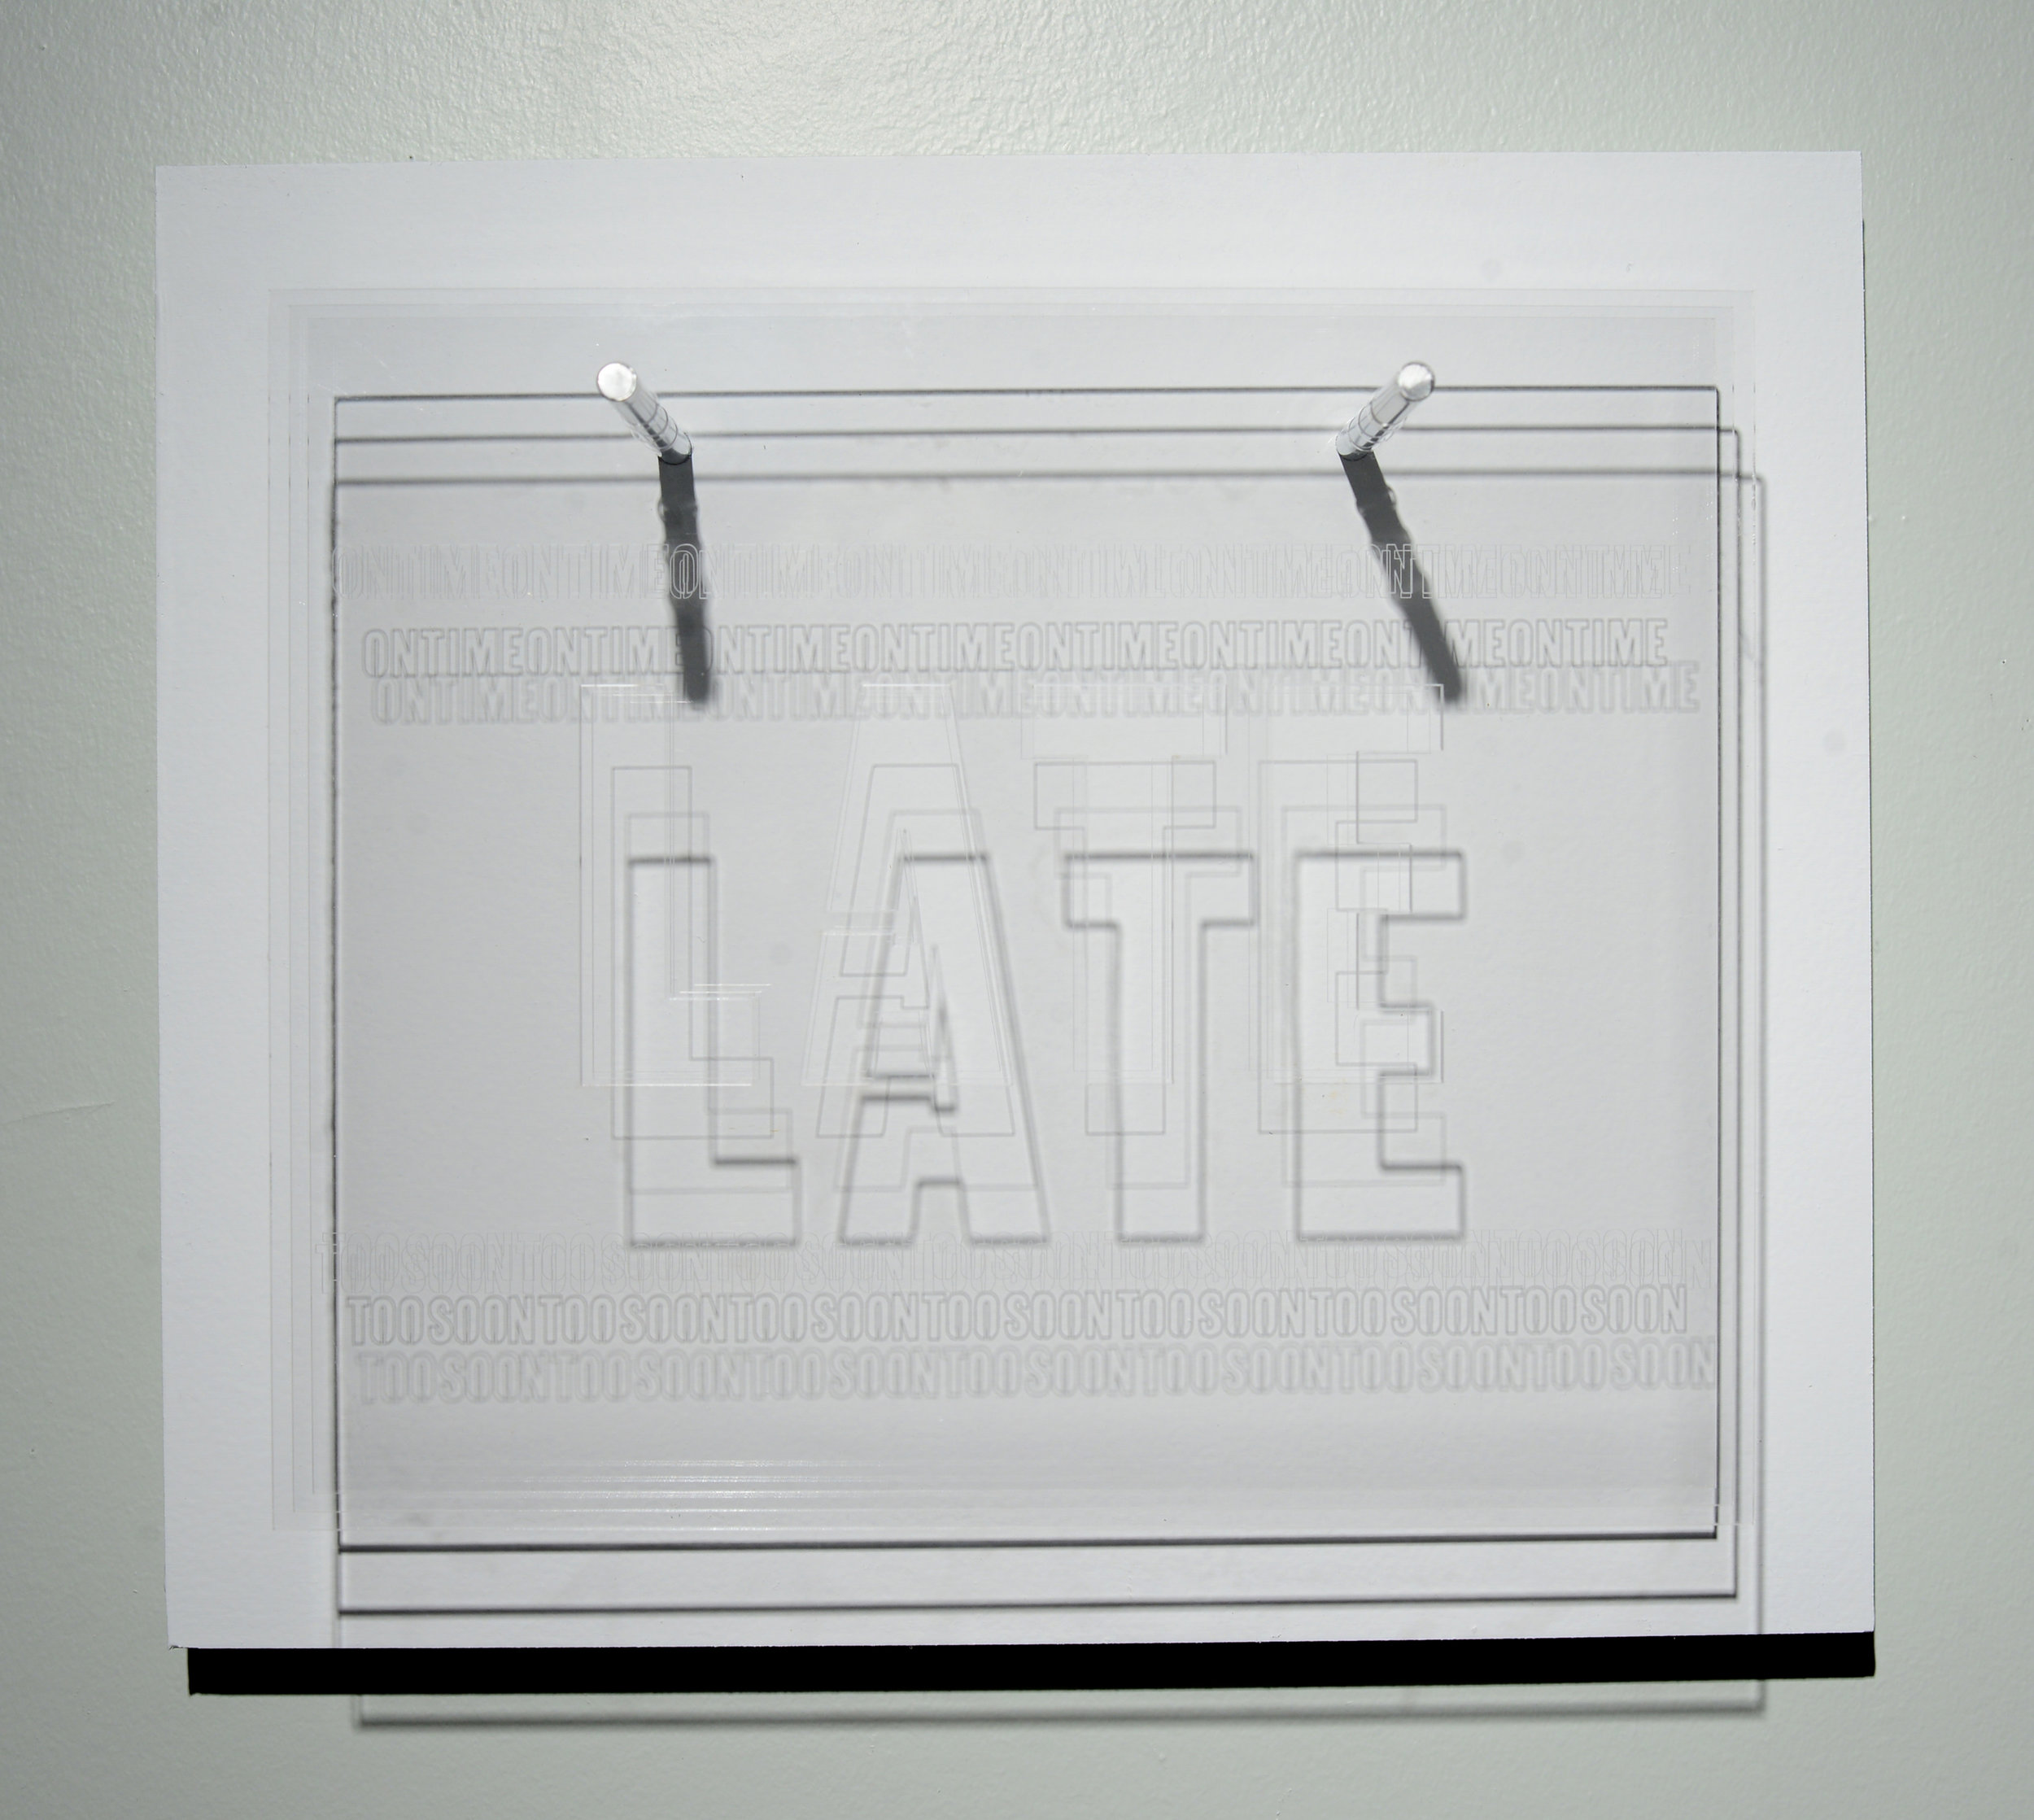 Late.JPG